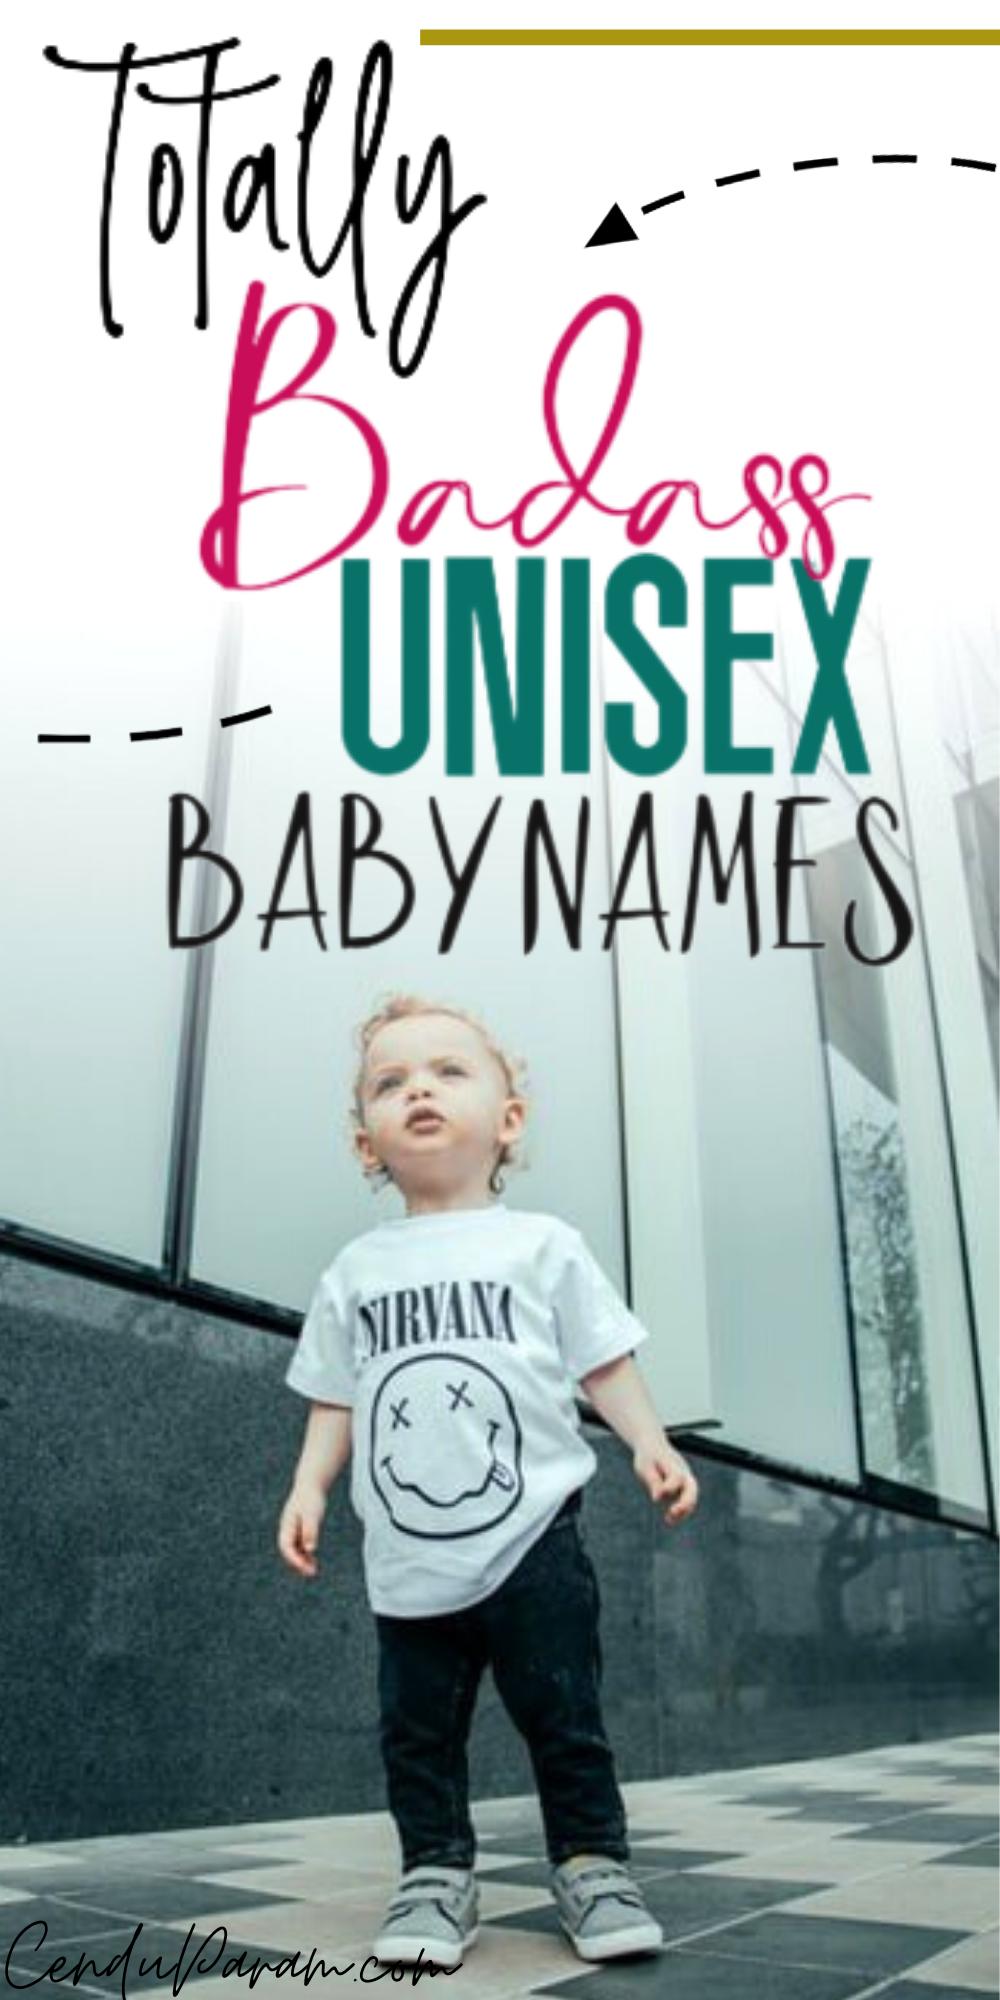 Badass Unisex Names That Work For Boys Or Girls (Gender Friendly)